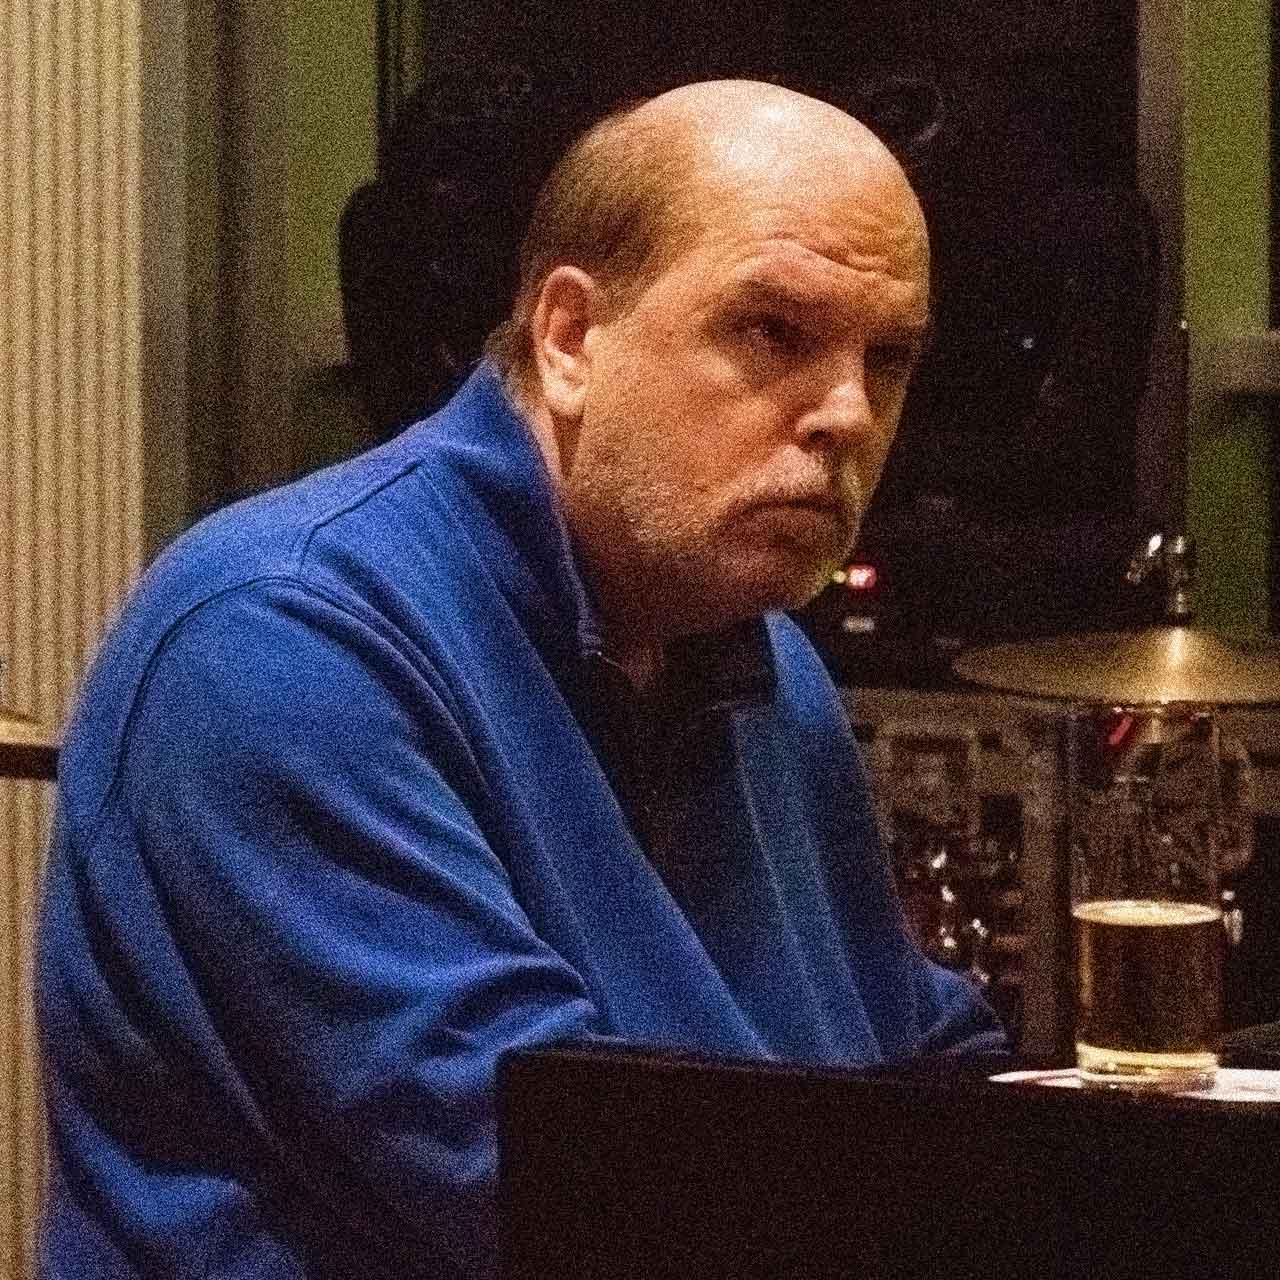 Ernst Gaida-Hartmann plays piano